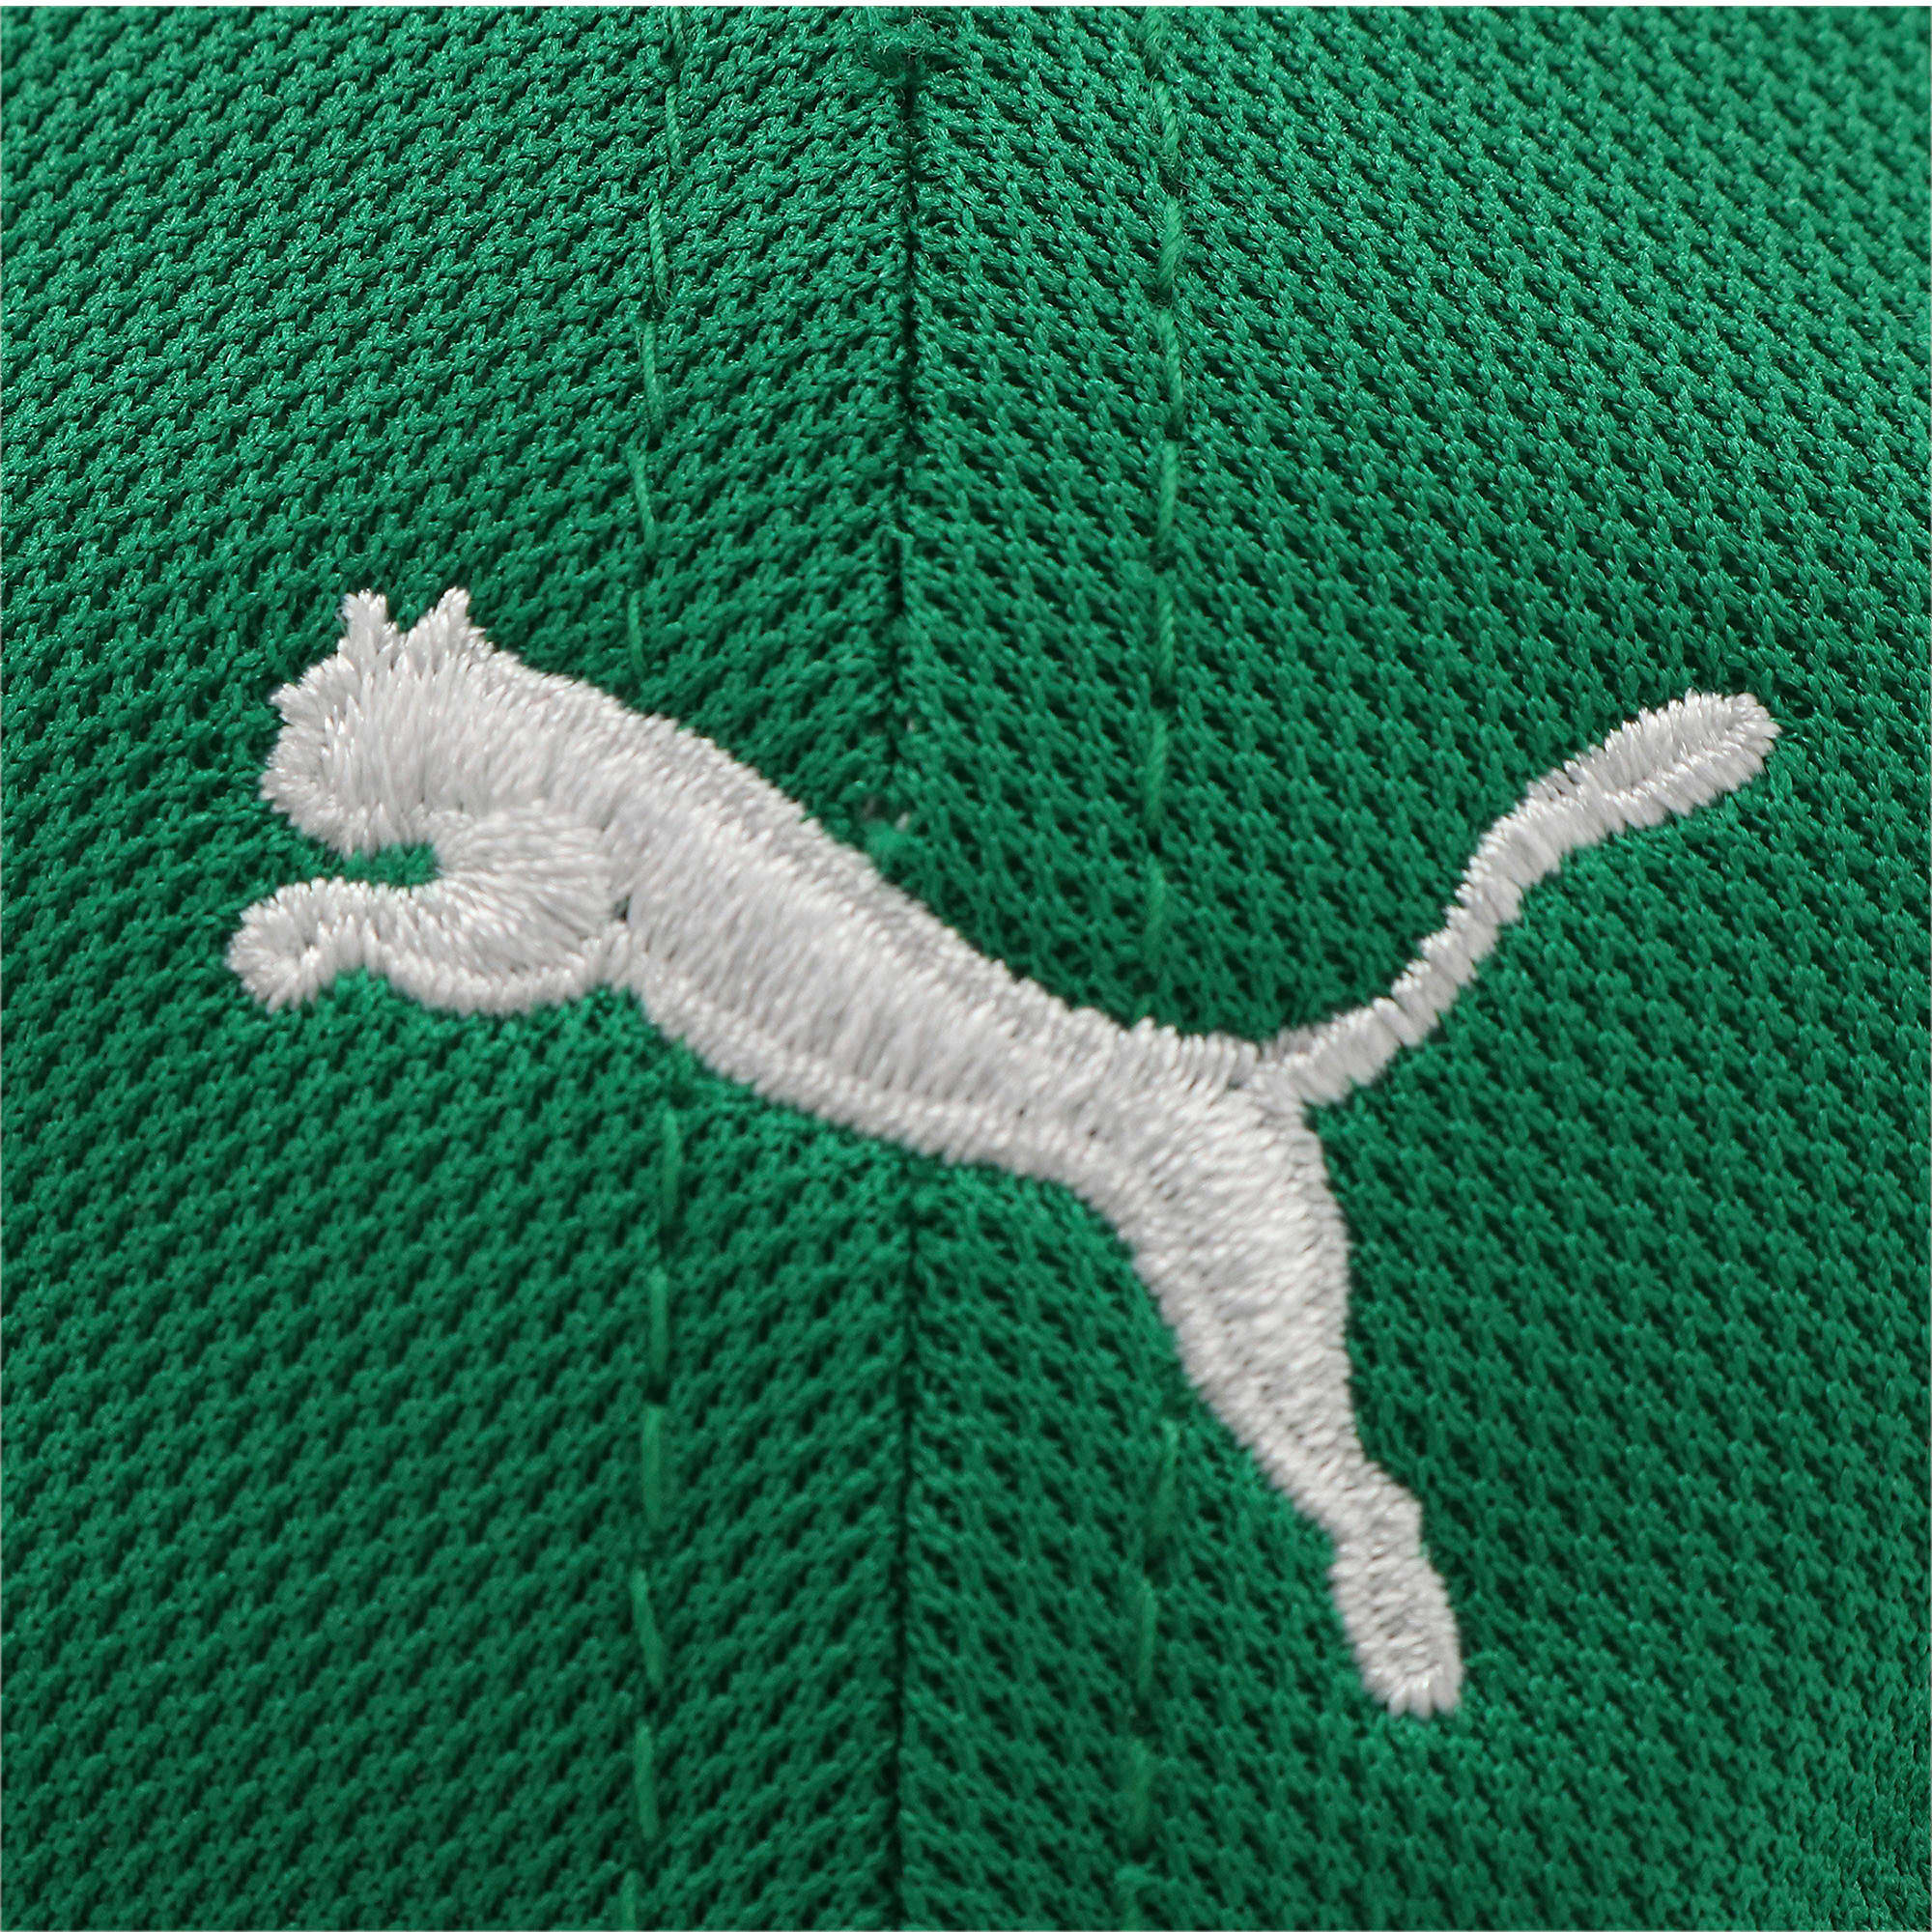 Thumbnail 3 of ゴルフ ユーティリティ パッチ 110 キャップ WM, Bright White-WM Green, medium-JPN